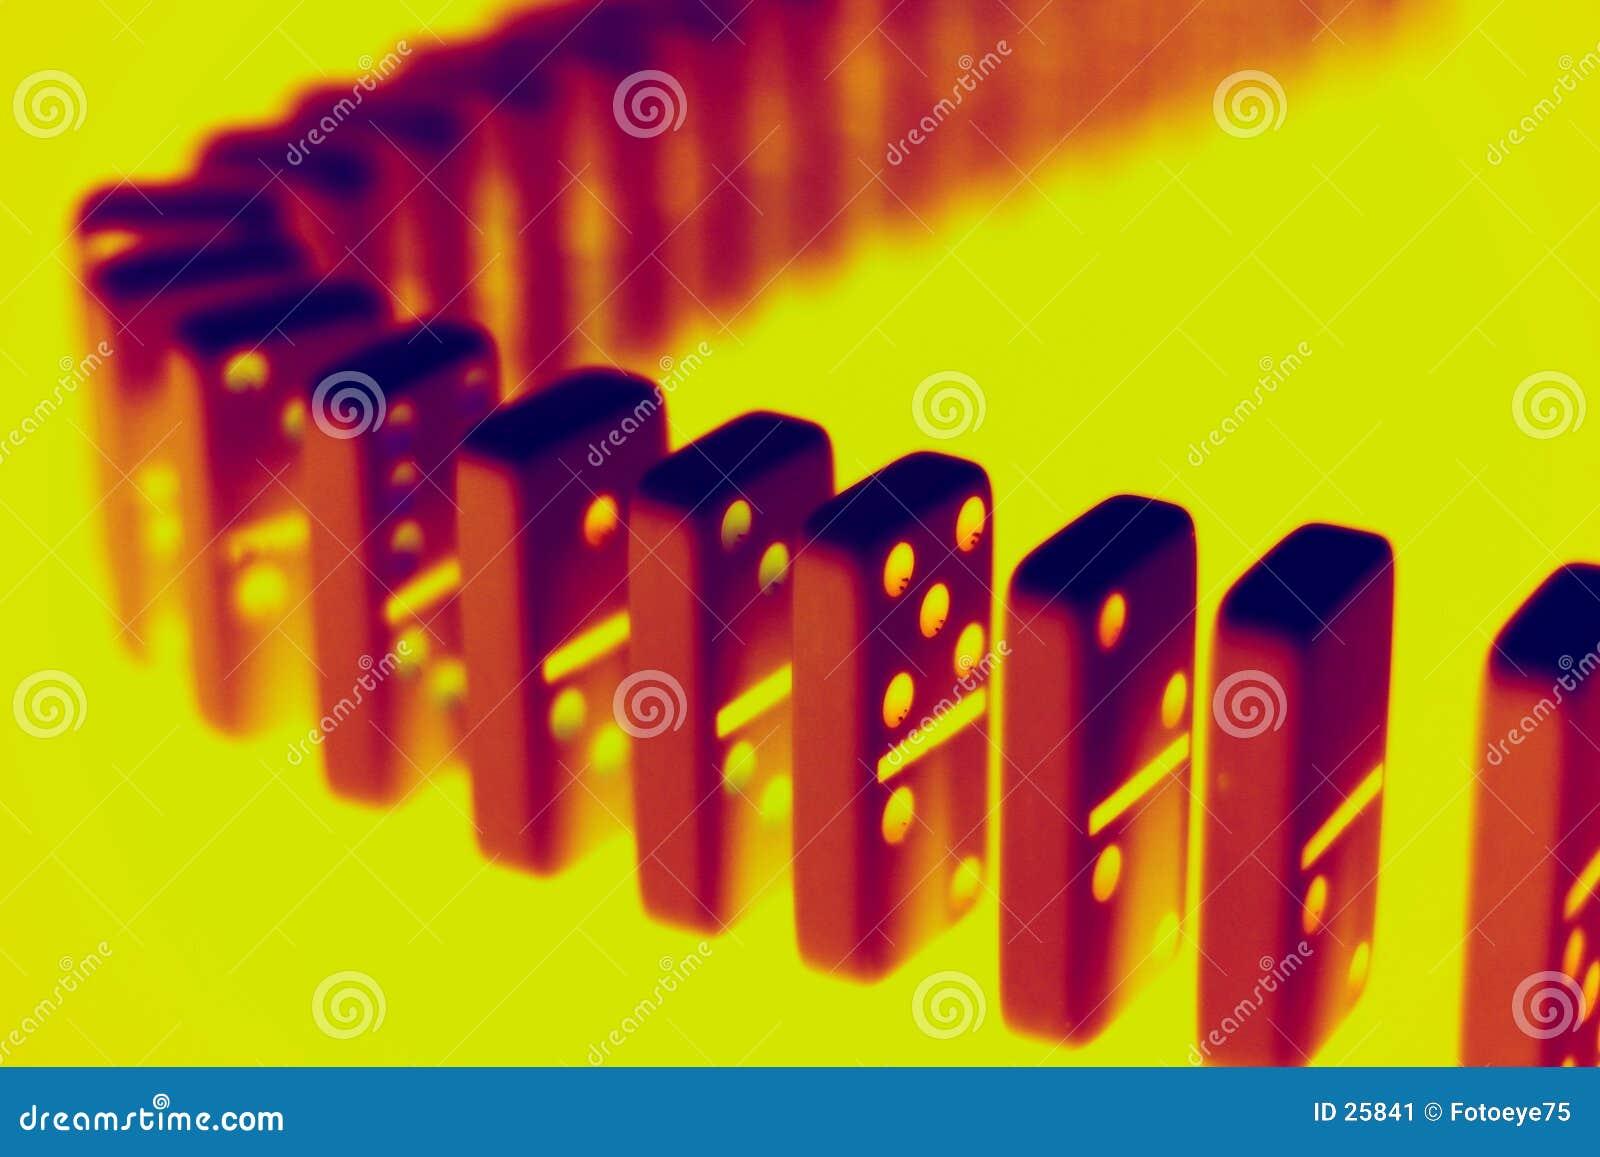 Download Dominós radiactivos imagen de archivo. Imagen de juguete - 25841